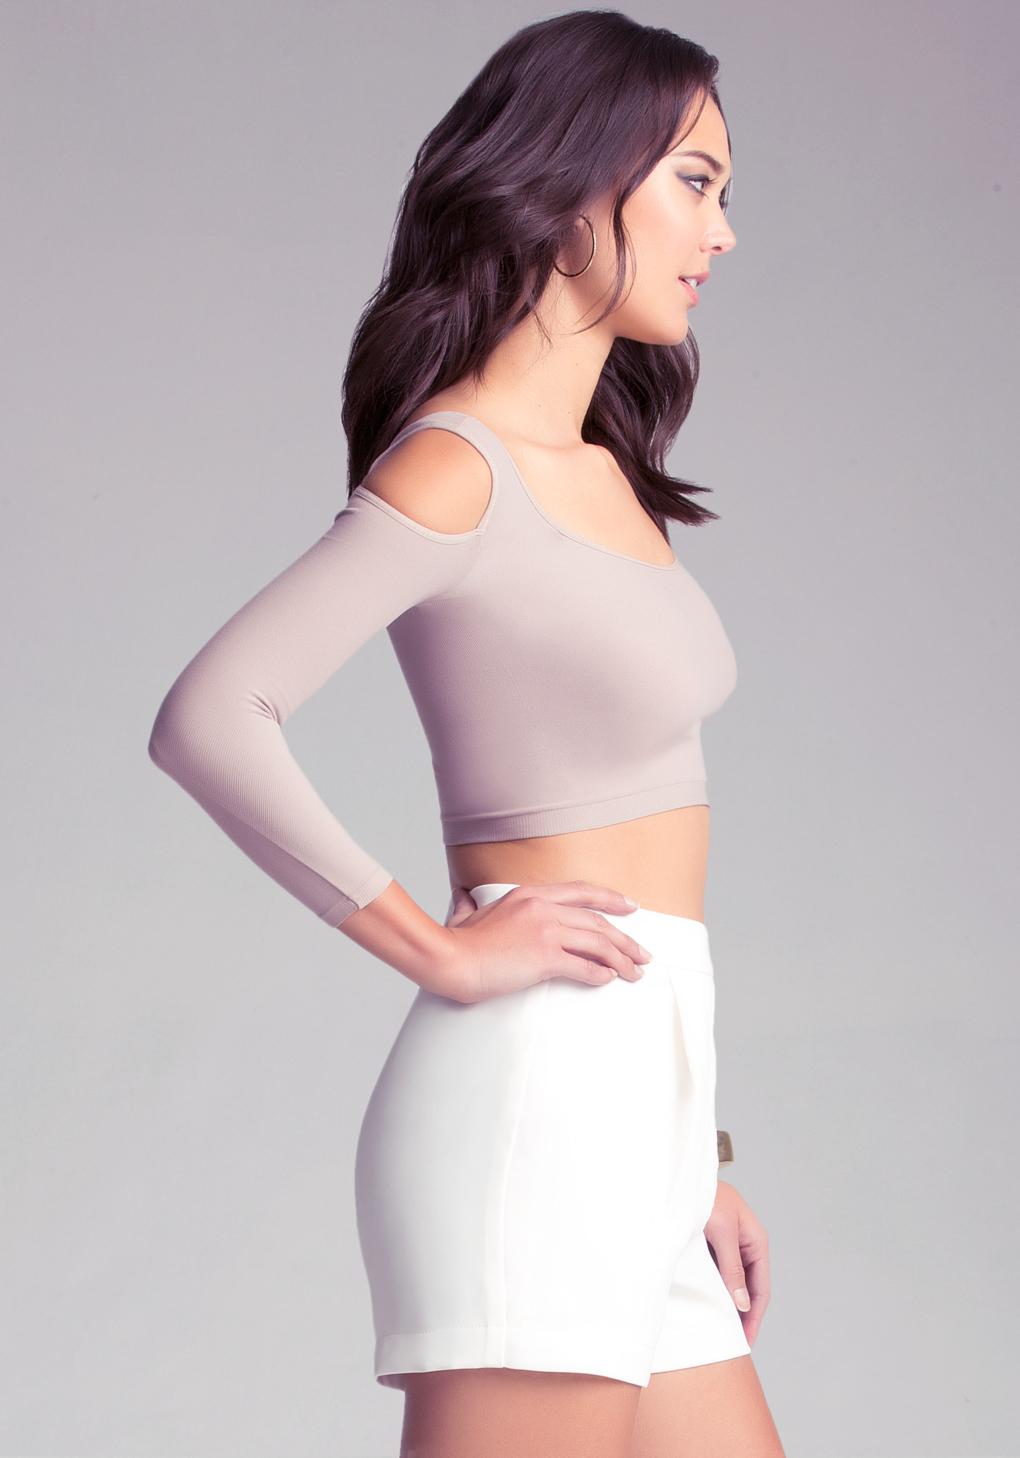 ec697b68be1ca1 Gallery. Women s Rainbow Print Tops Women s Light Denim Shirts Women s Cold  Shoulder ...